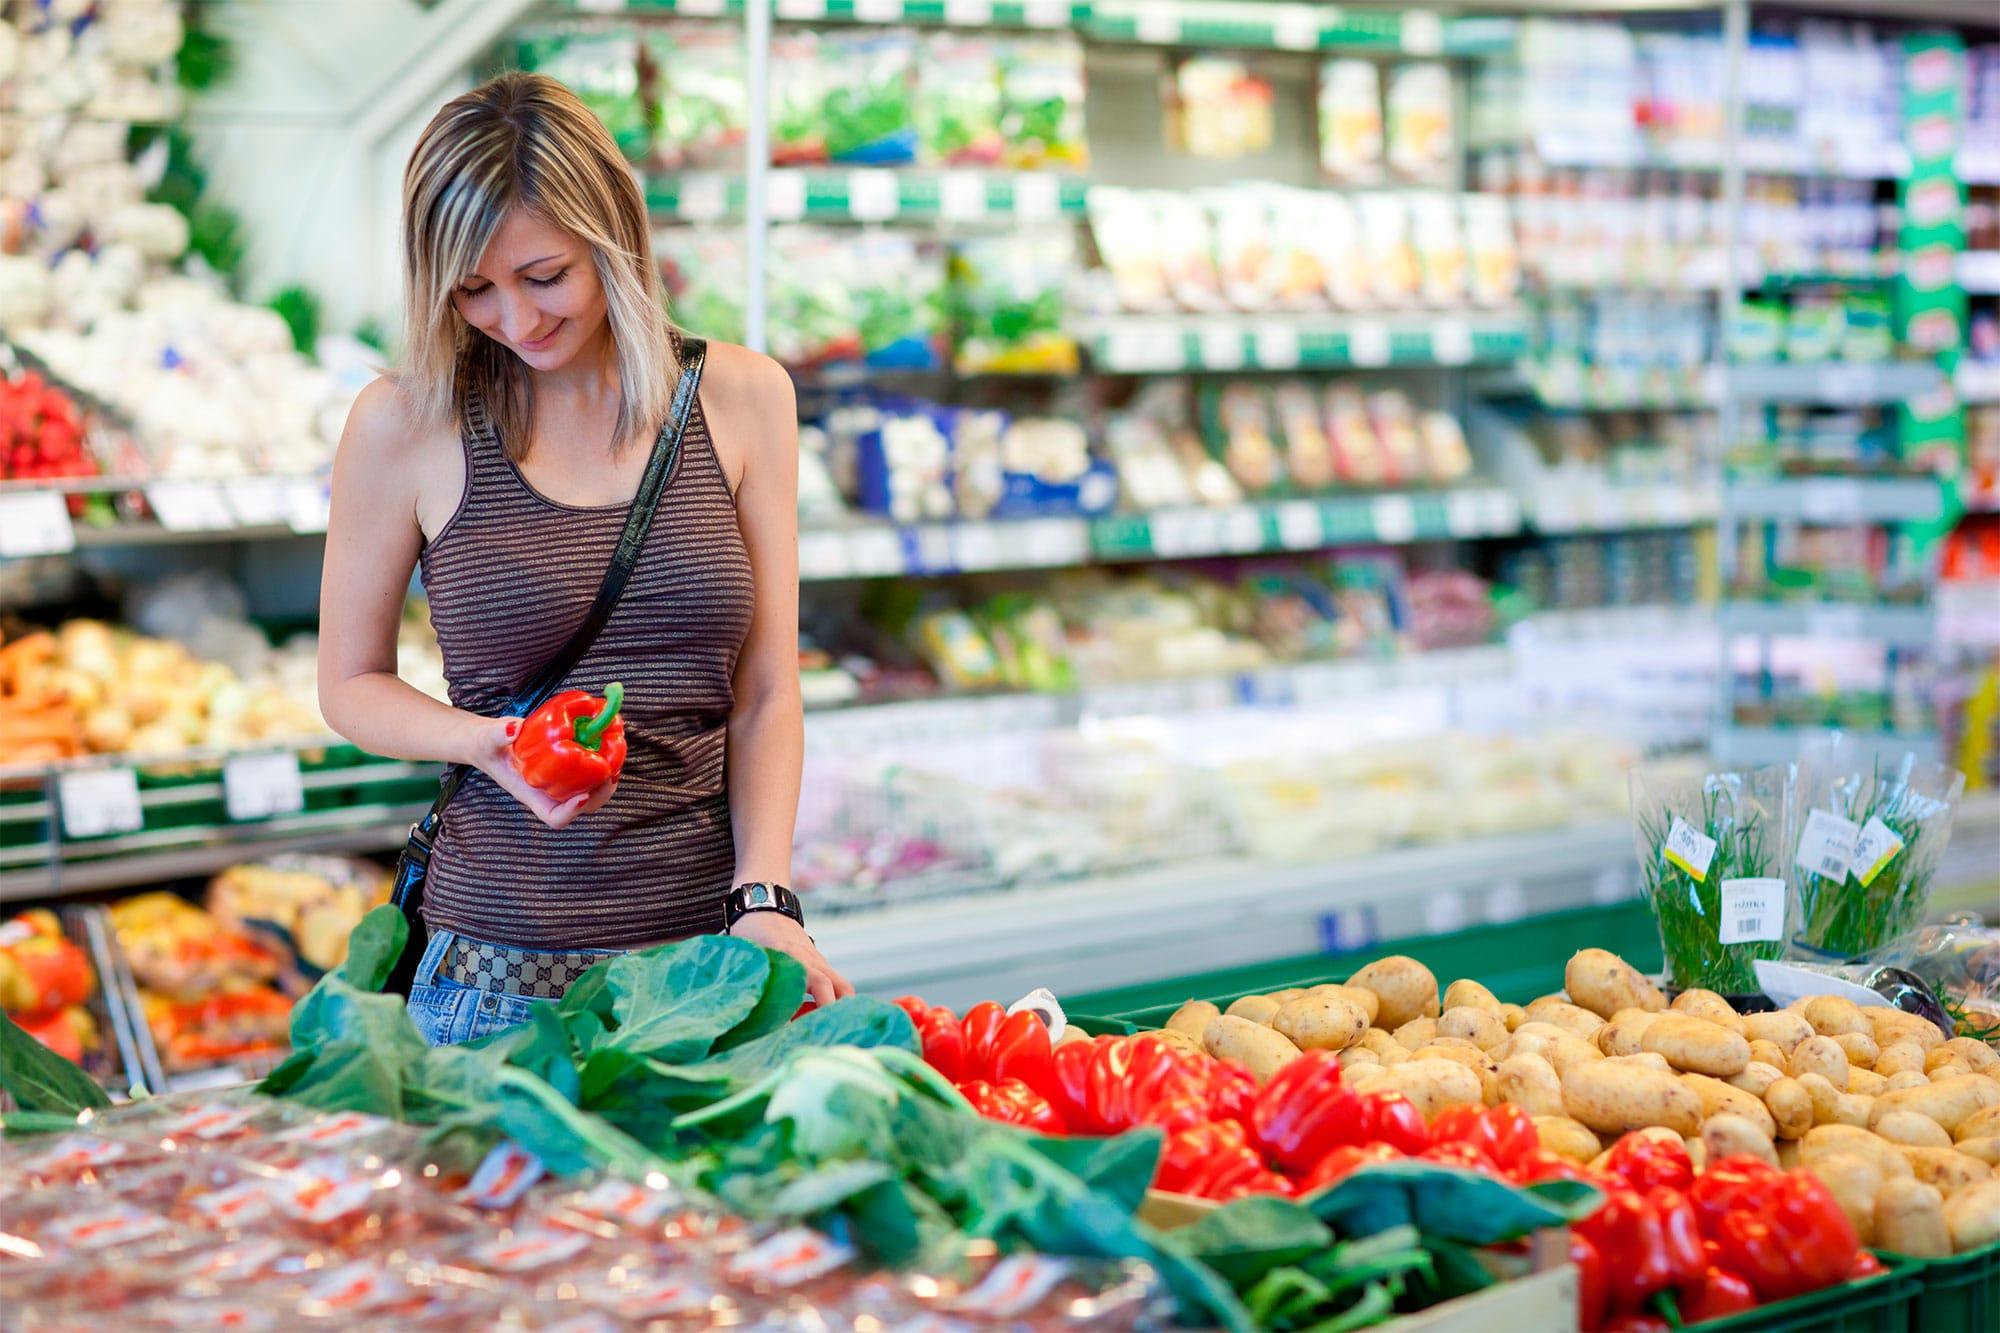 ETRON onRetail im Lebensmittelhandel - Frau im Supermarkt